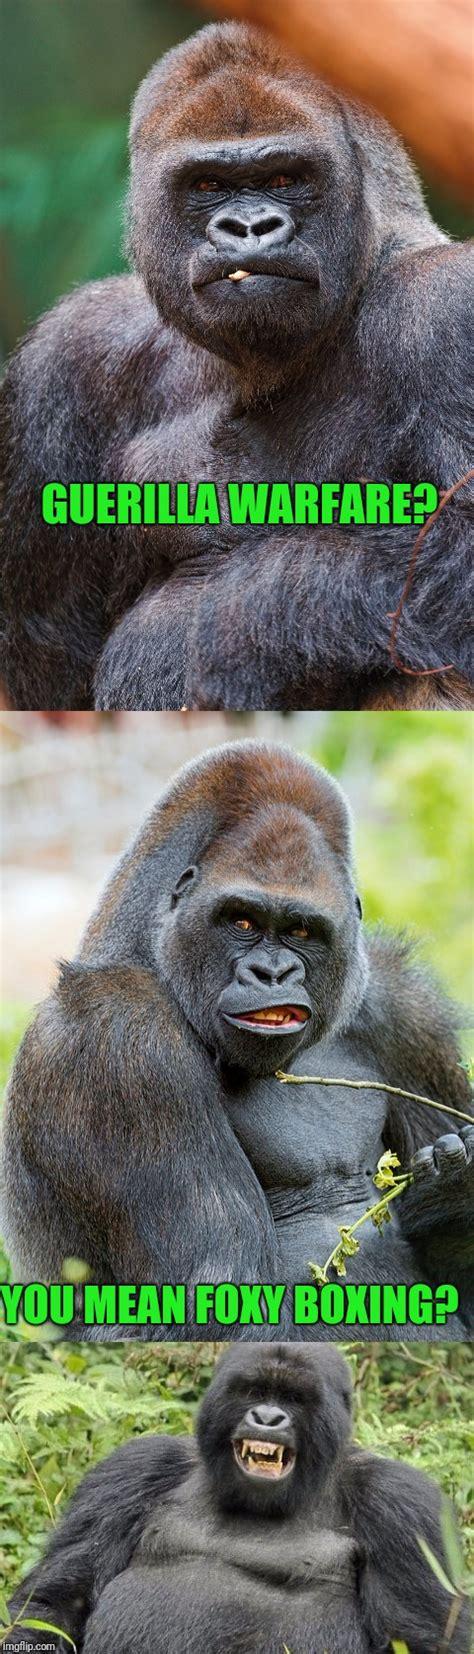 Gorilla Warfare Meme - king of the jungle imgflip